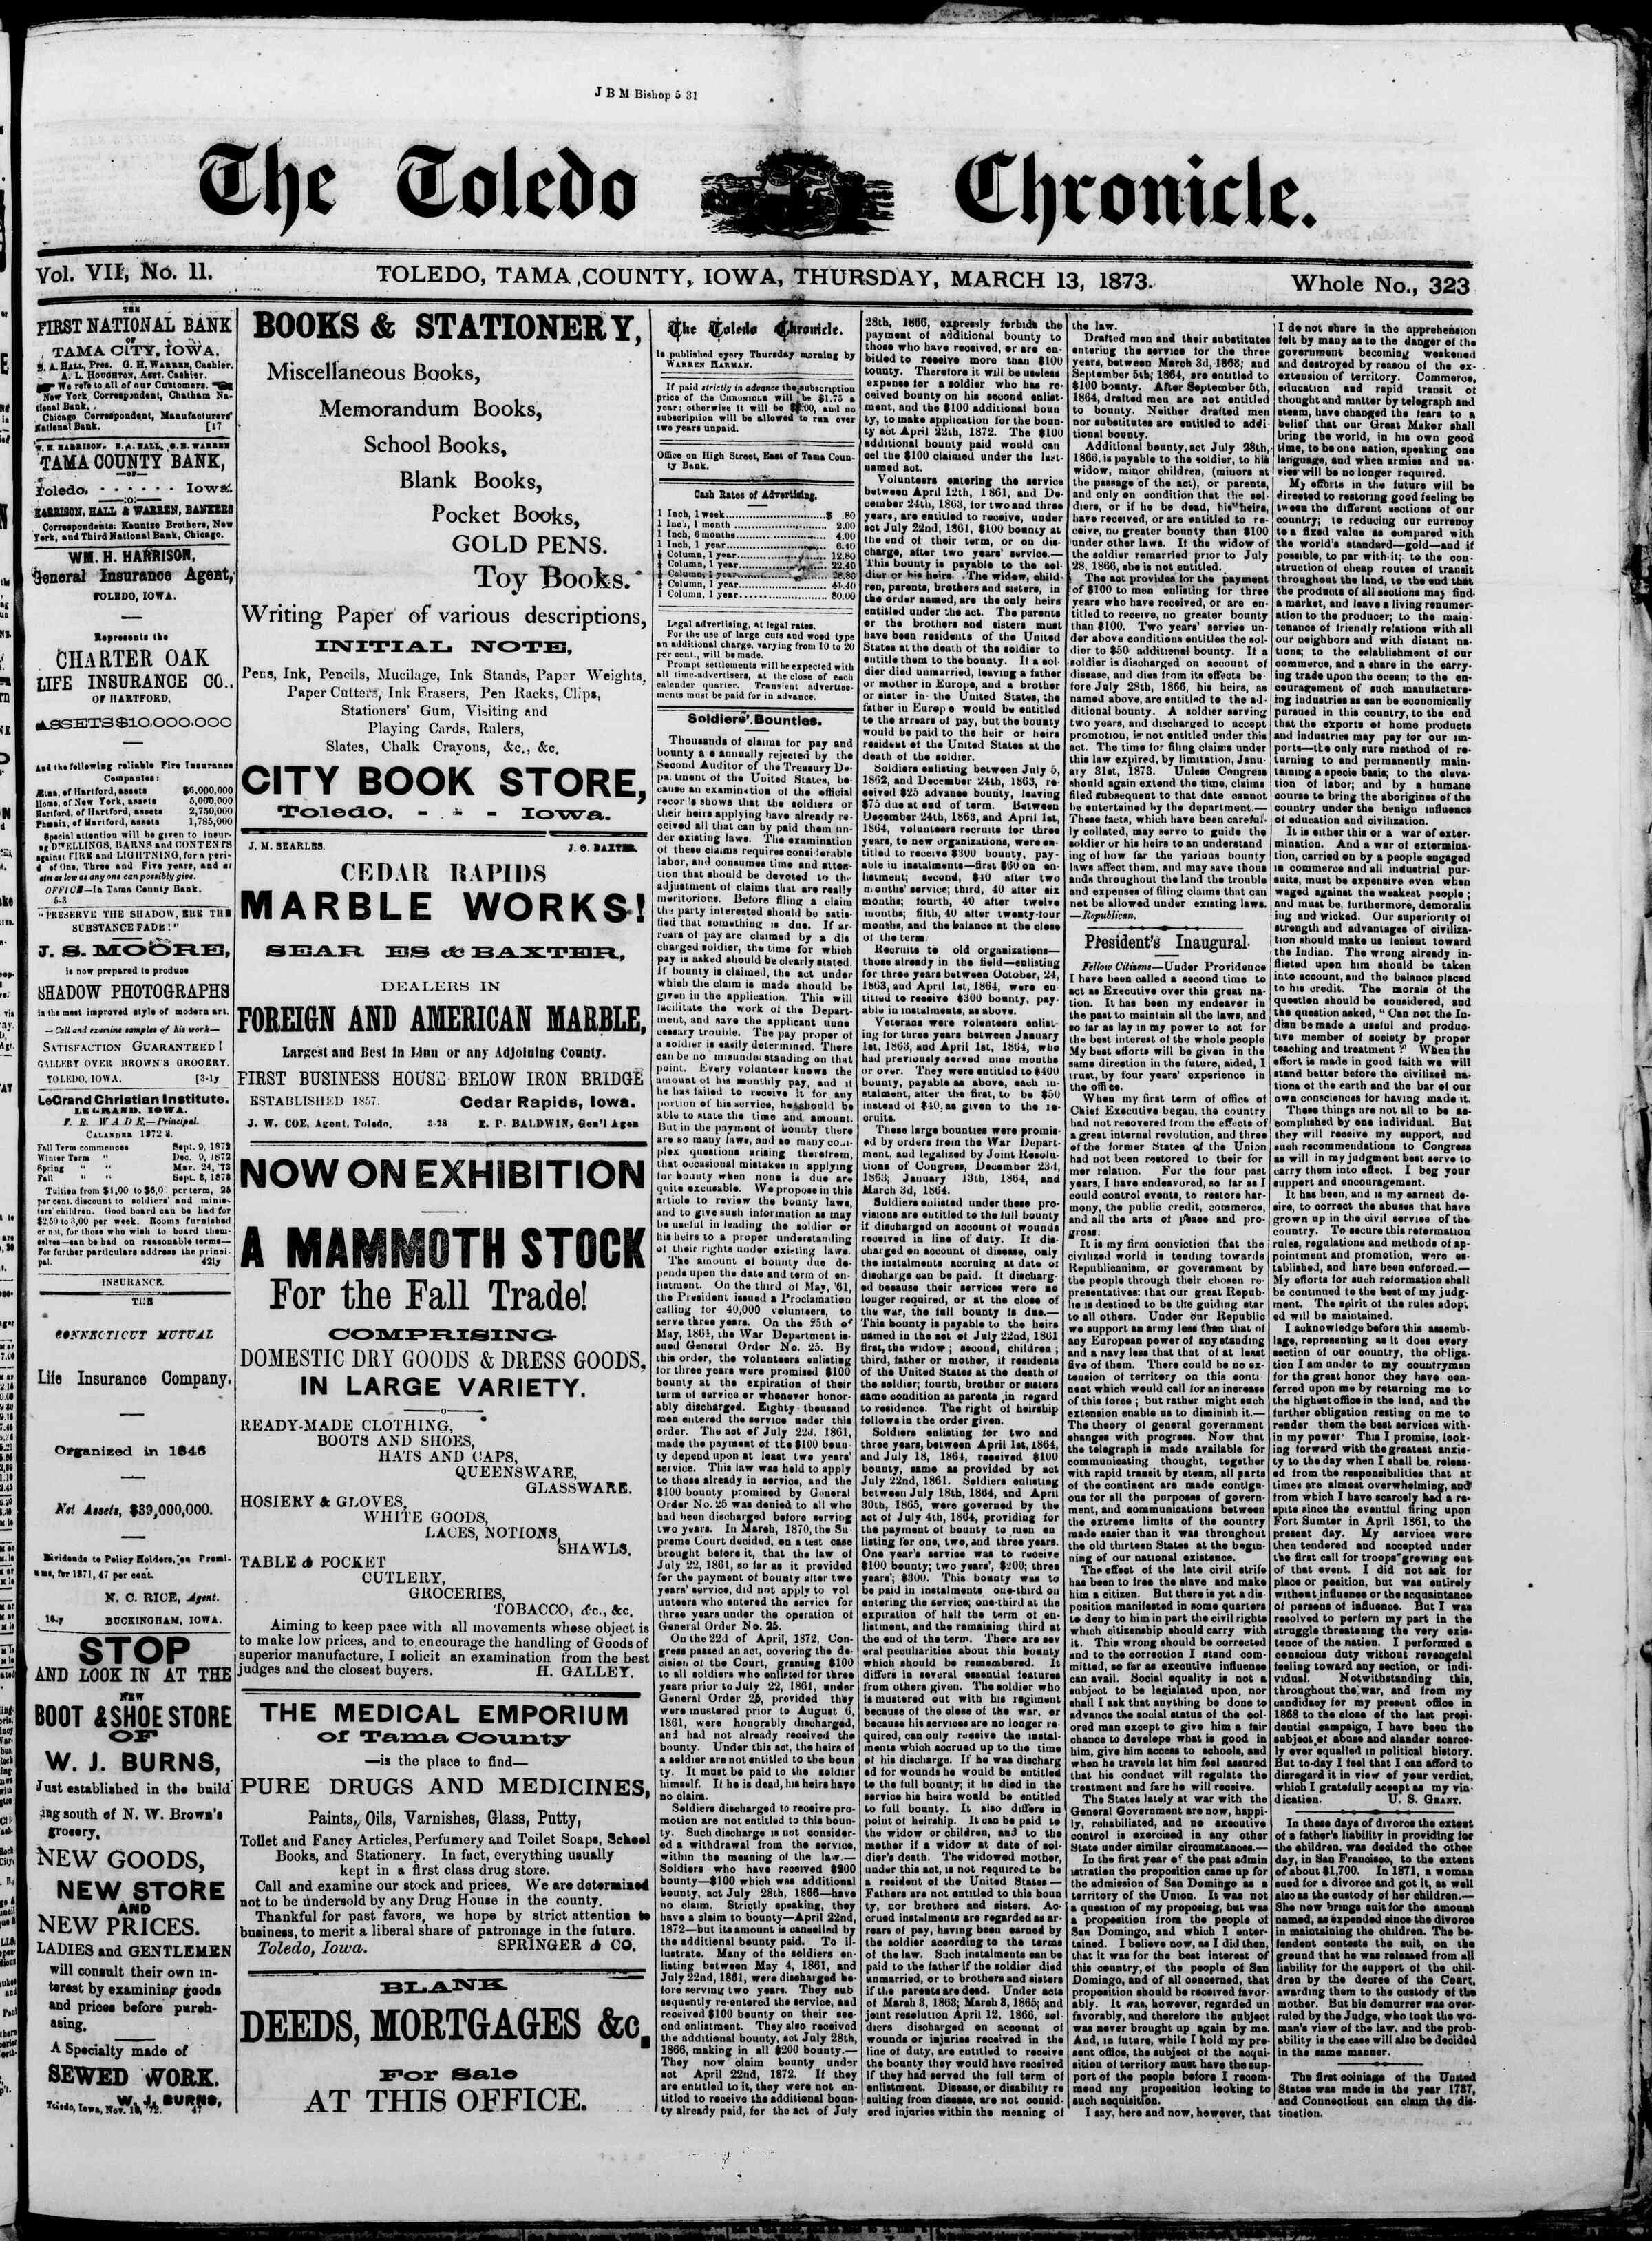 13 Mart 1873 Tarihli The Toledo chronicle Dergisi Sayfa 1